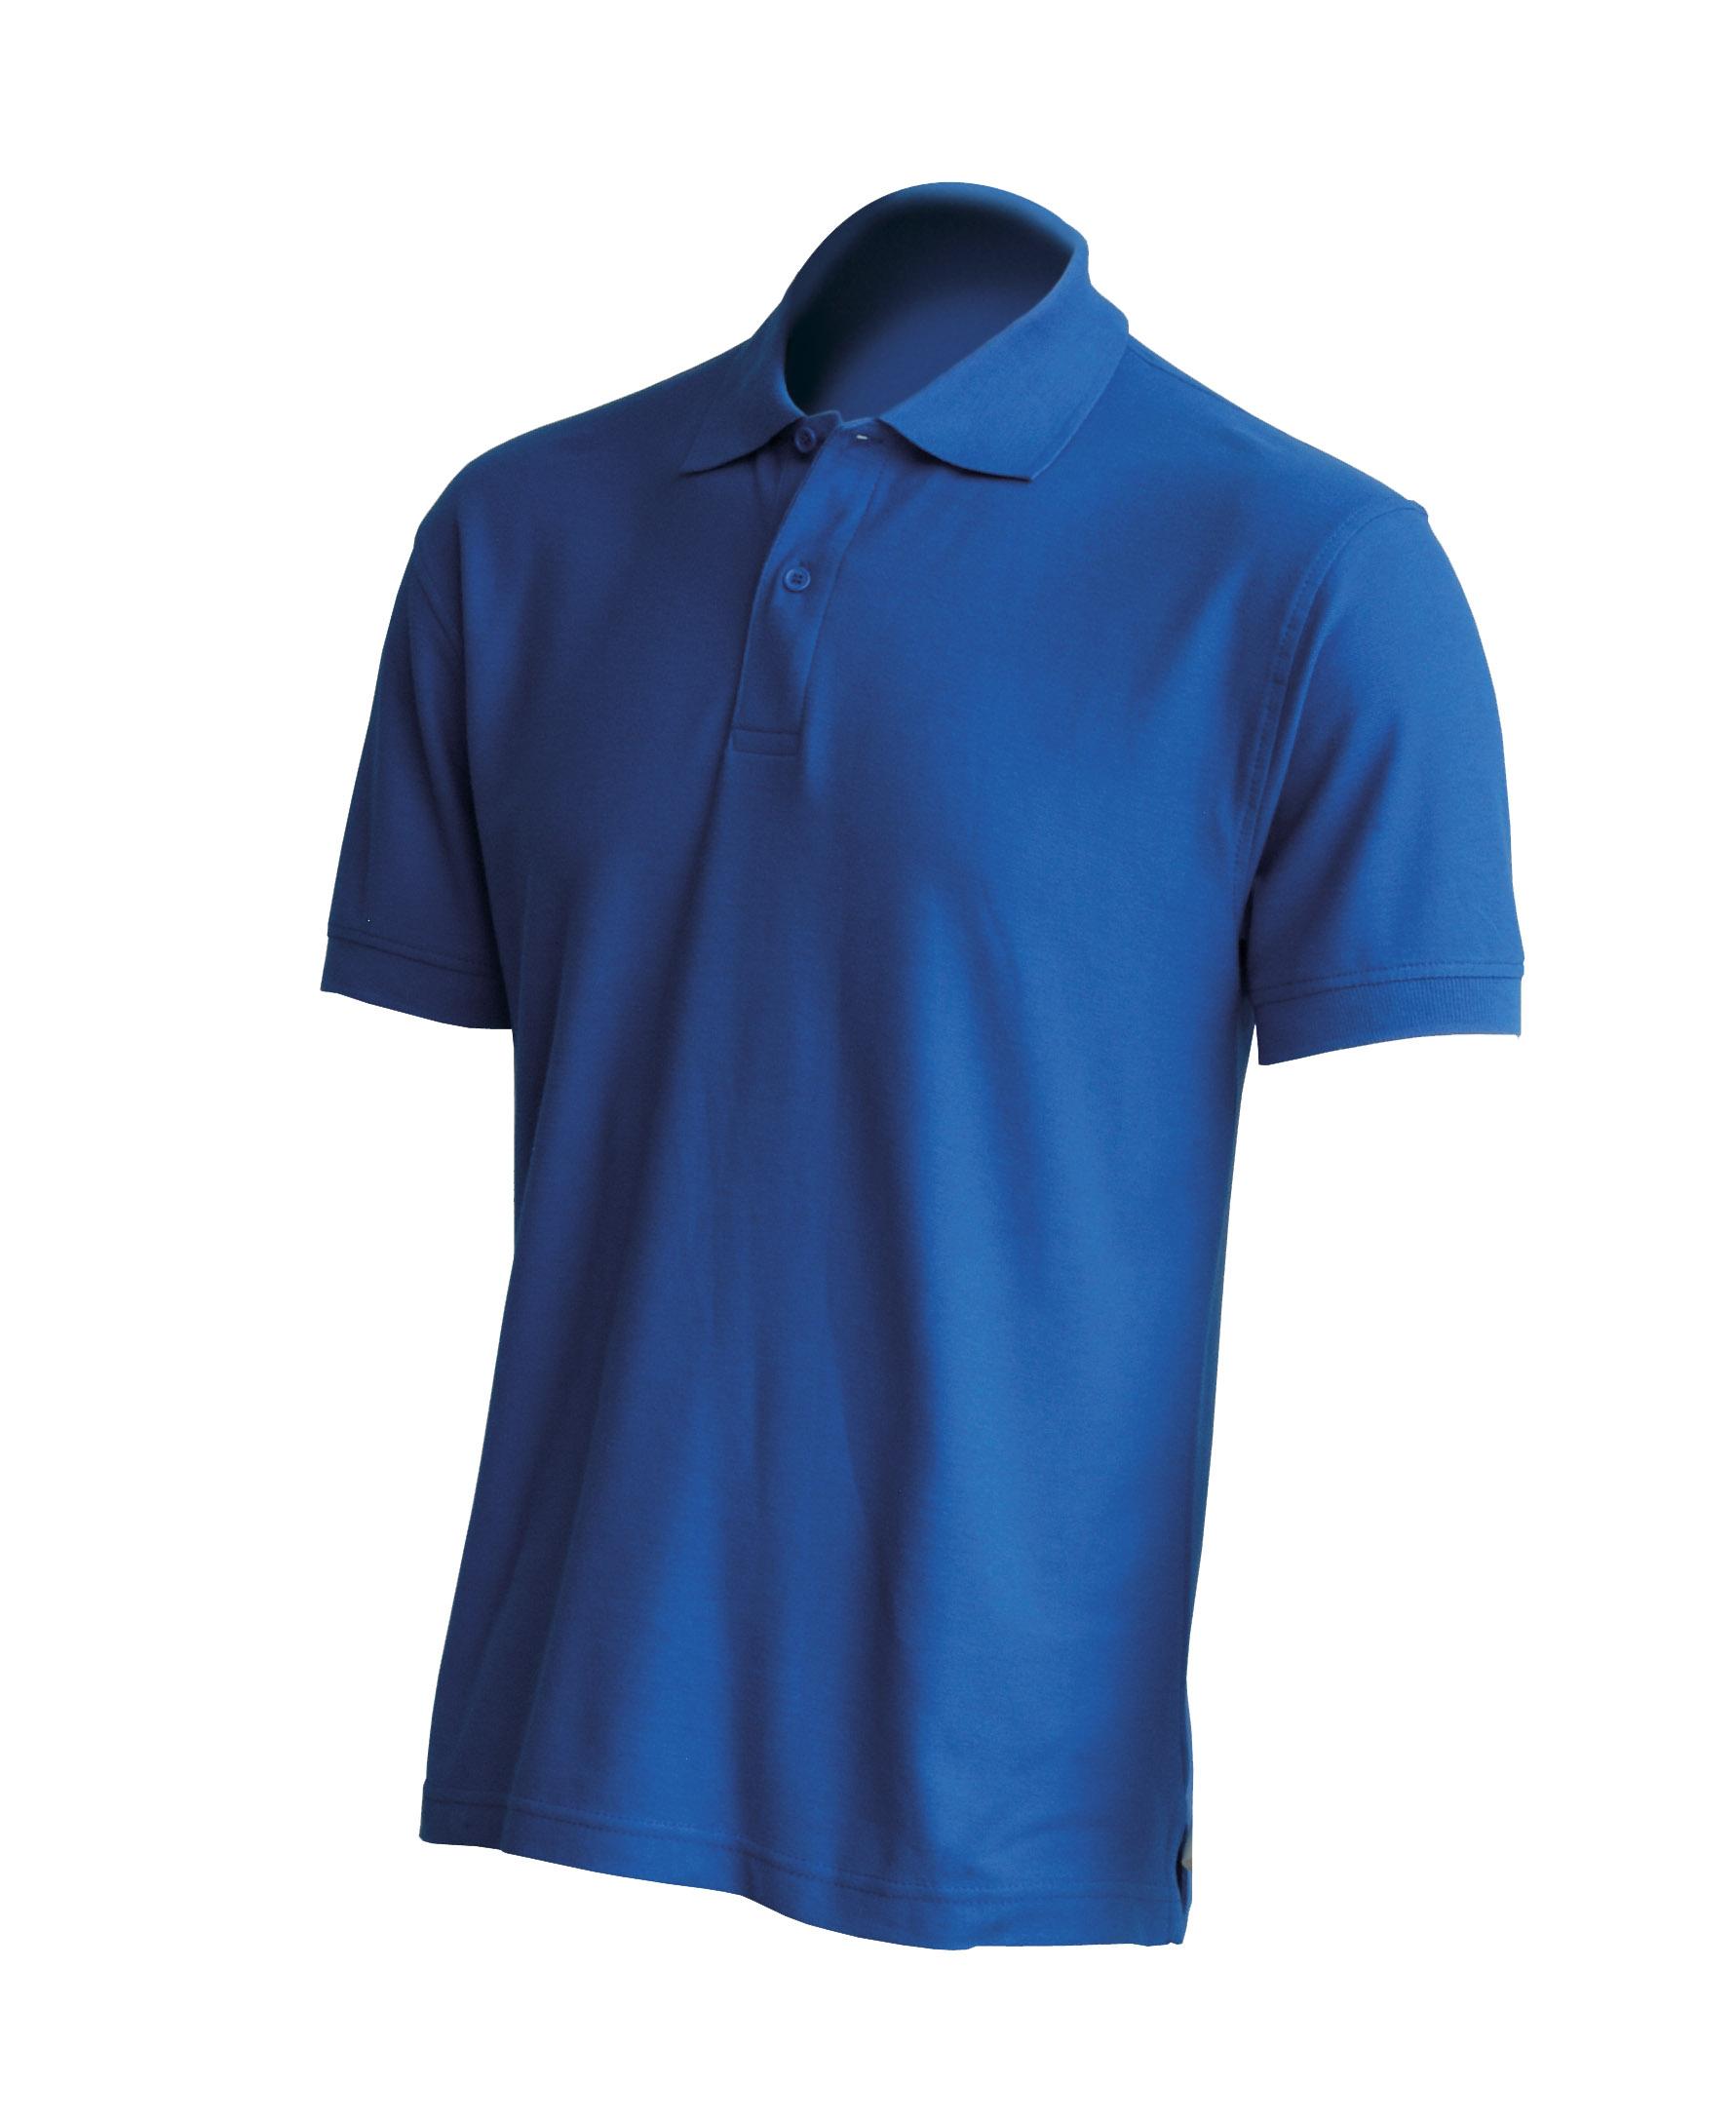 Muška polo majica kratkih rukava, royal plava